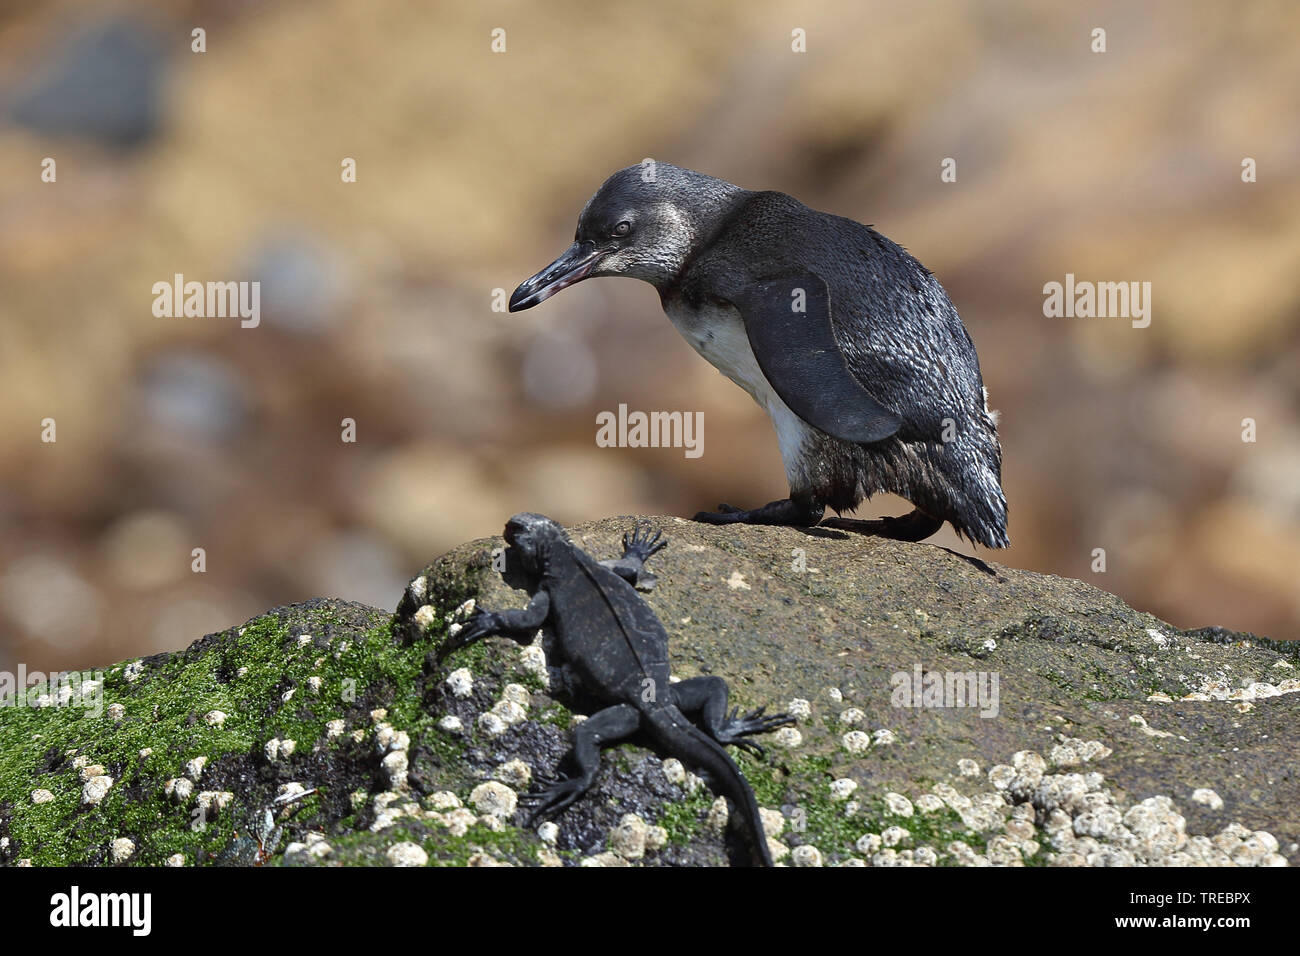 Galapagos penguin (Spheniscus mendiculus), juvenile at the rocky coast with marine iguanas, Ecuador, Galapagos Islands Stock Photo